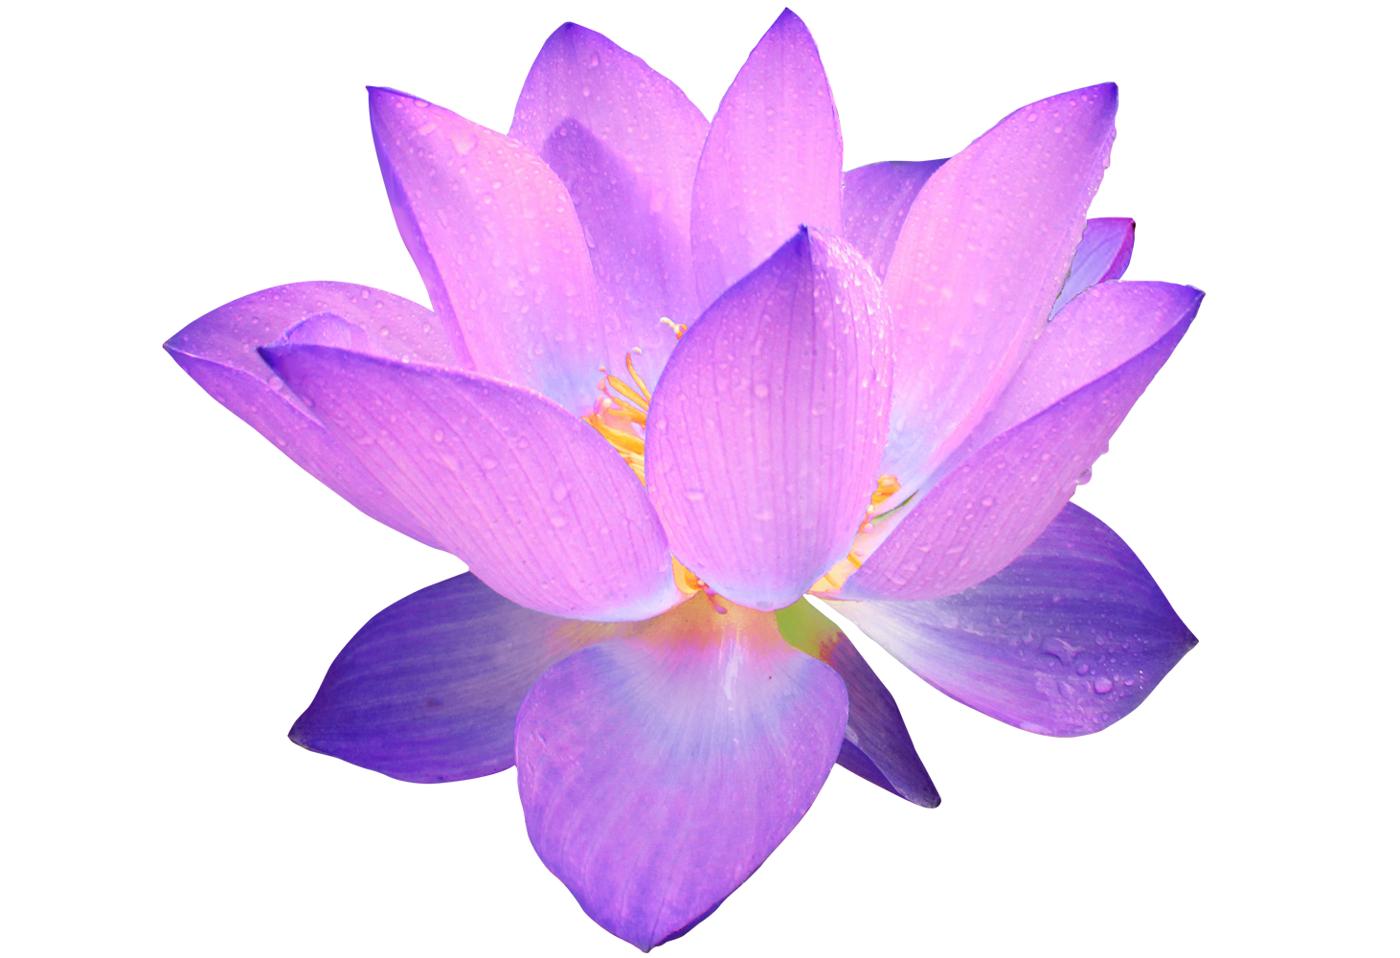 Photo 114537883 purple lotus flower png mg7otm clipart flowers 114537883 purple lotus flower png mg7otm clipart mightylinksfo